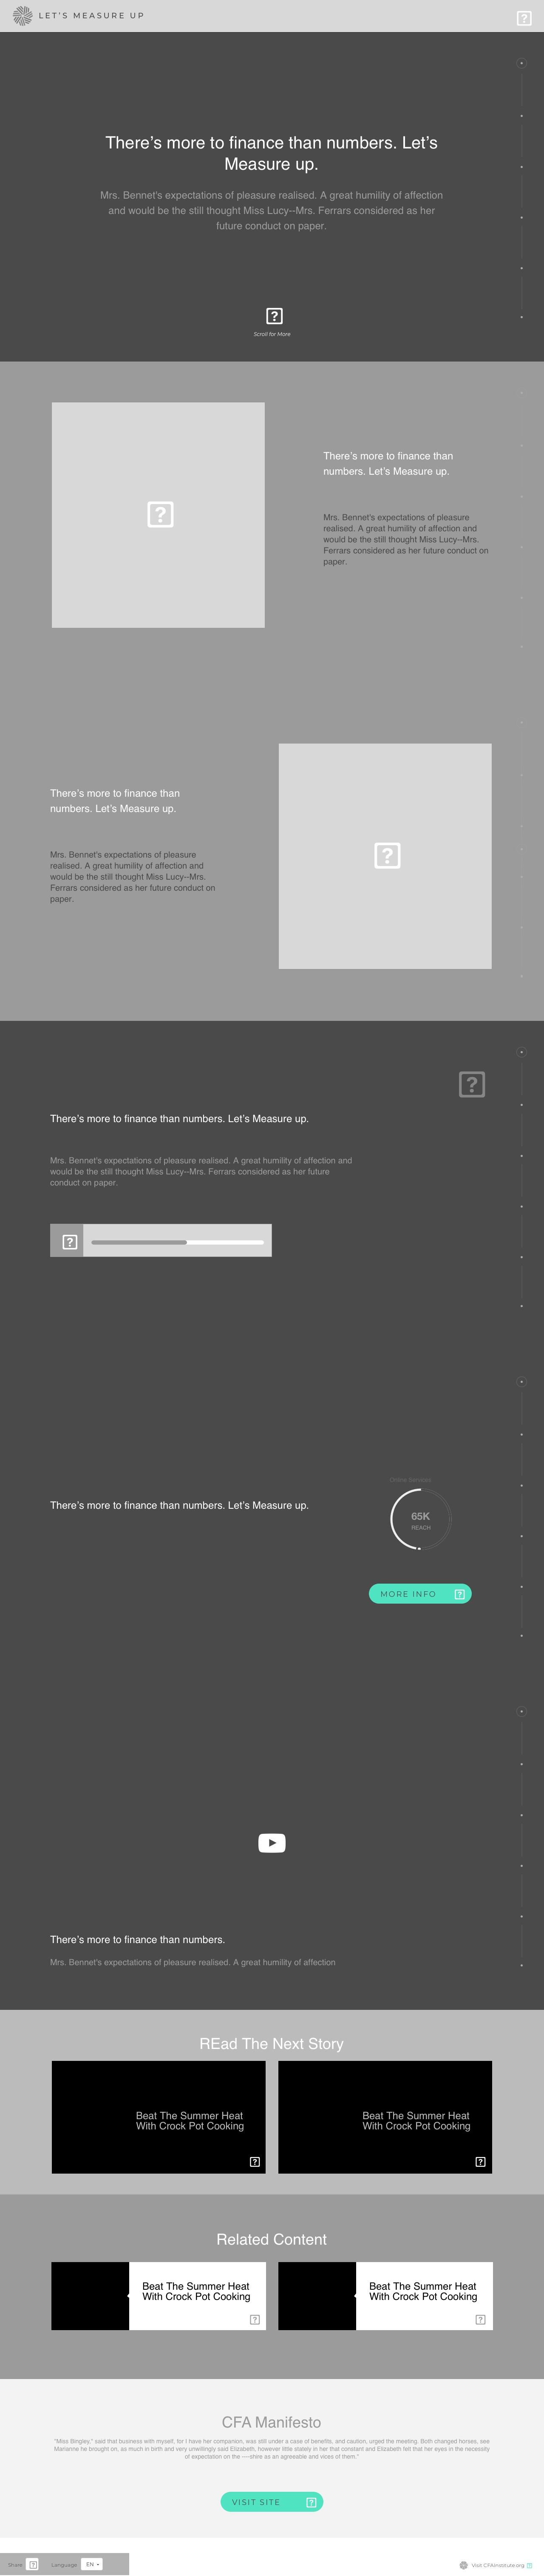 Story Page Wireframe (Desktop)